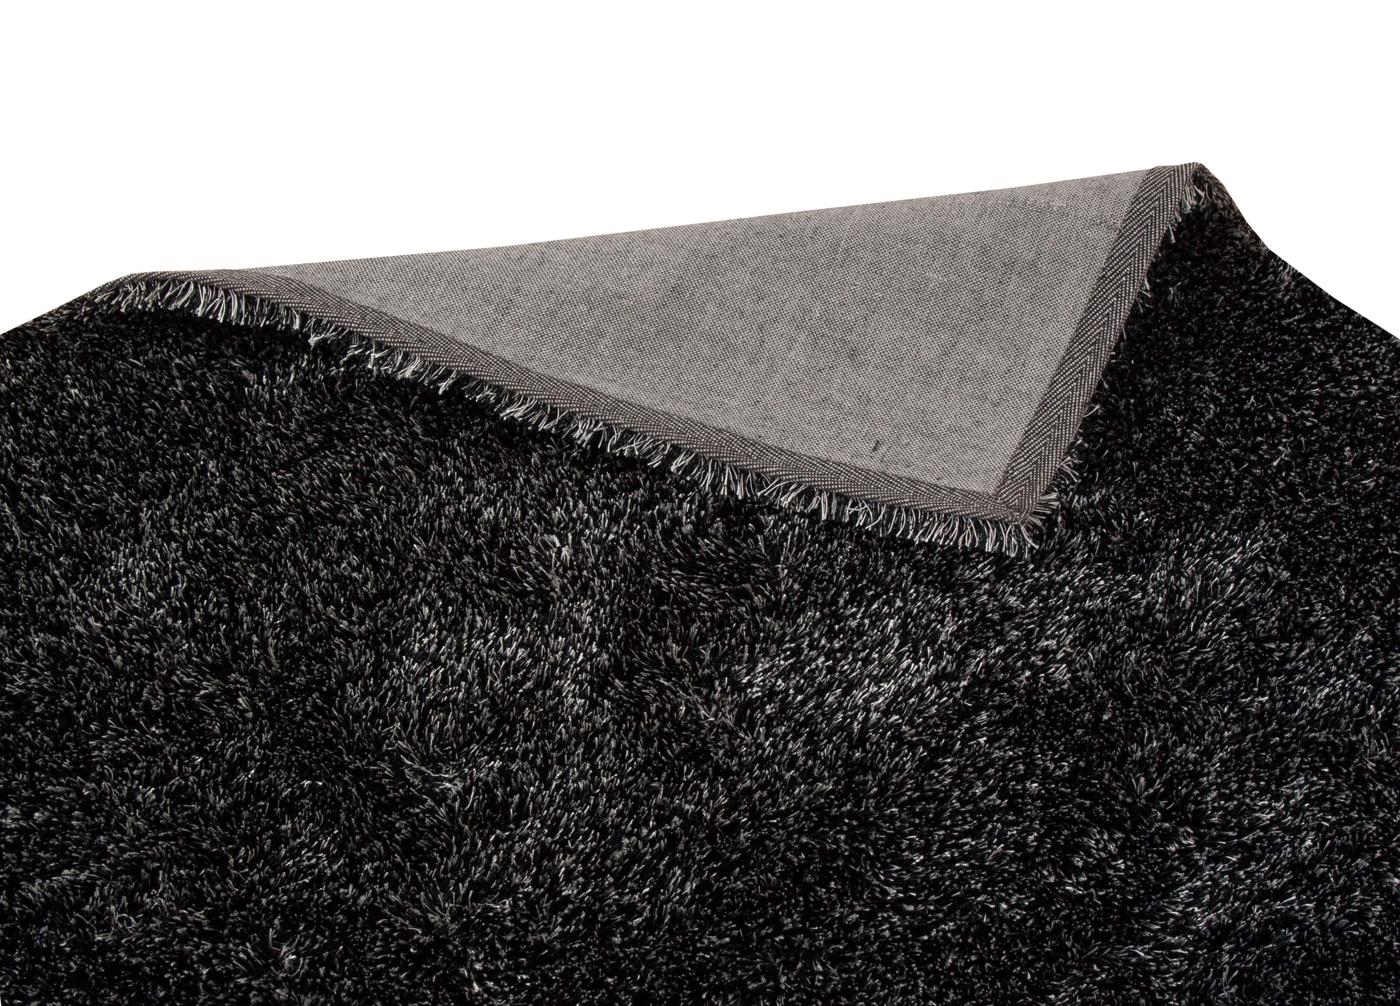 matta-gångmatta-rya matta